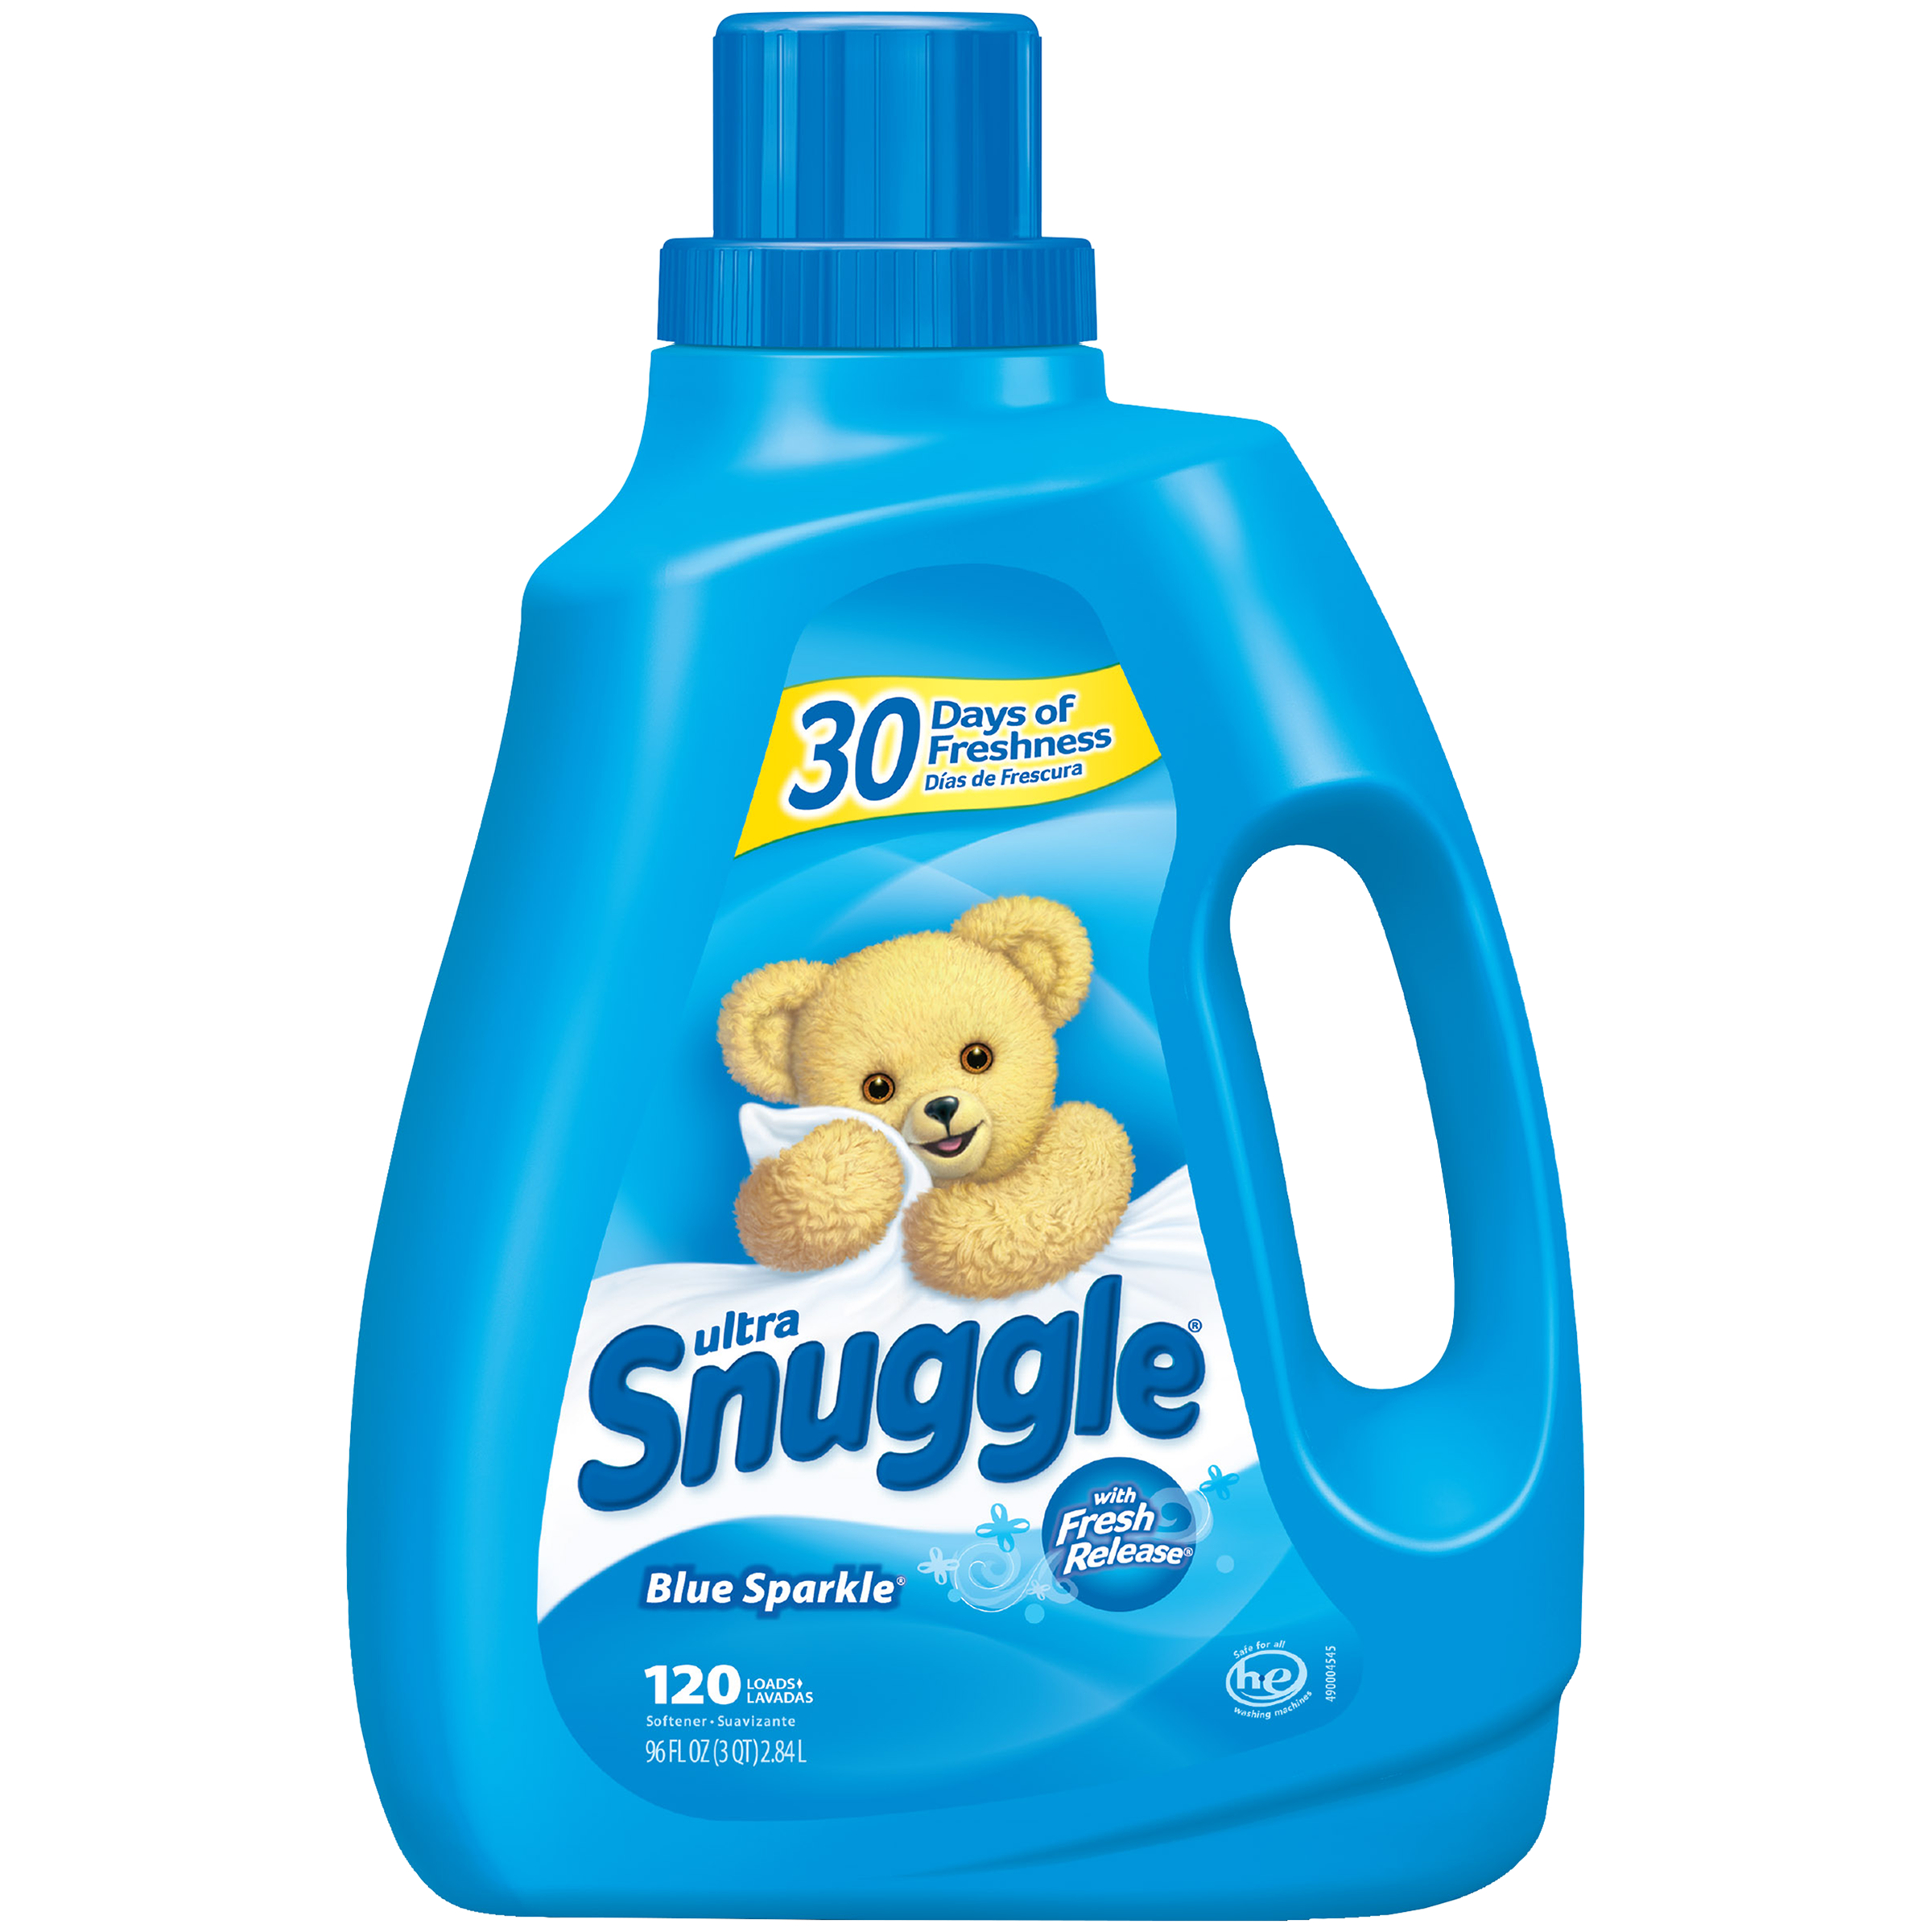 Snuggle Liquid Fabric Softener, Blue Sparkle, 96 Ounce, 120 Loads